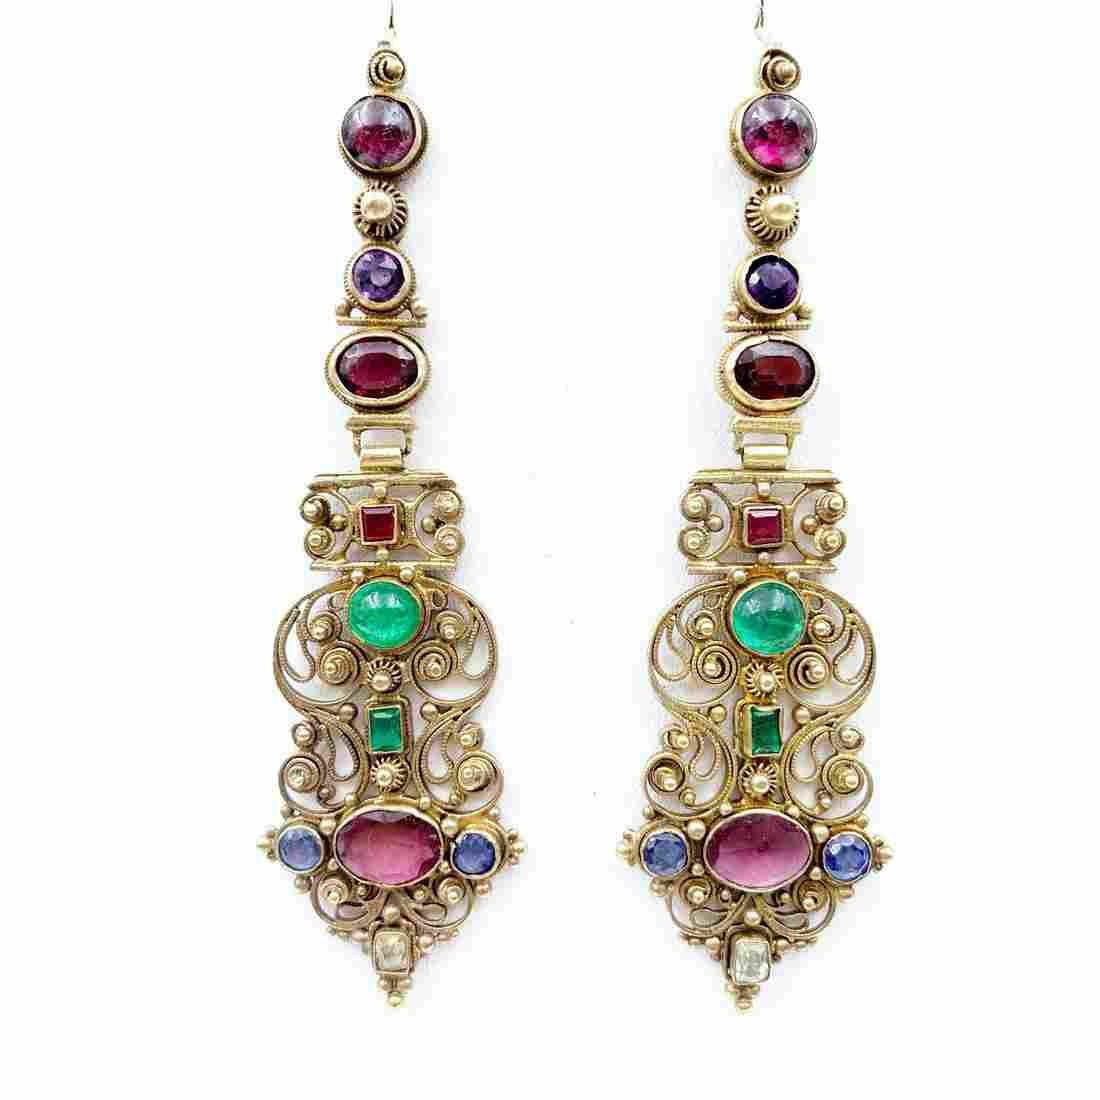 Rare Early Georgian Gold Cannetille Earrings